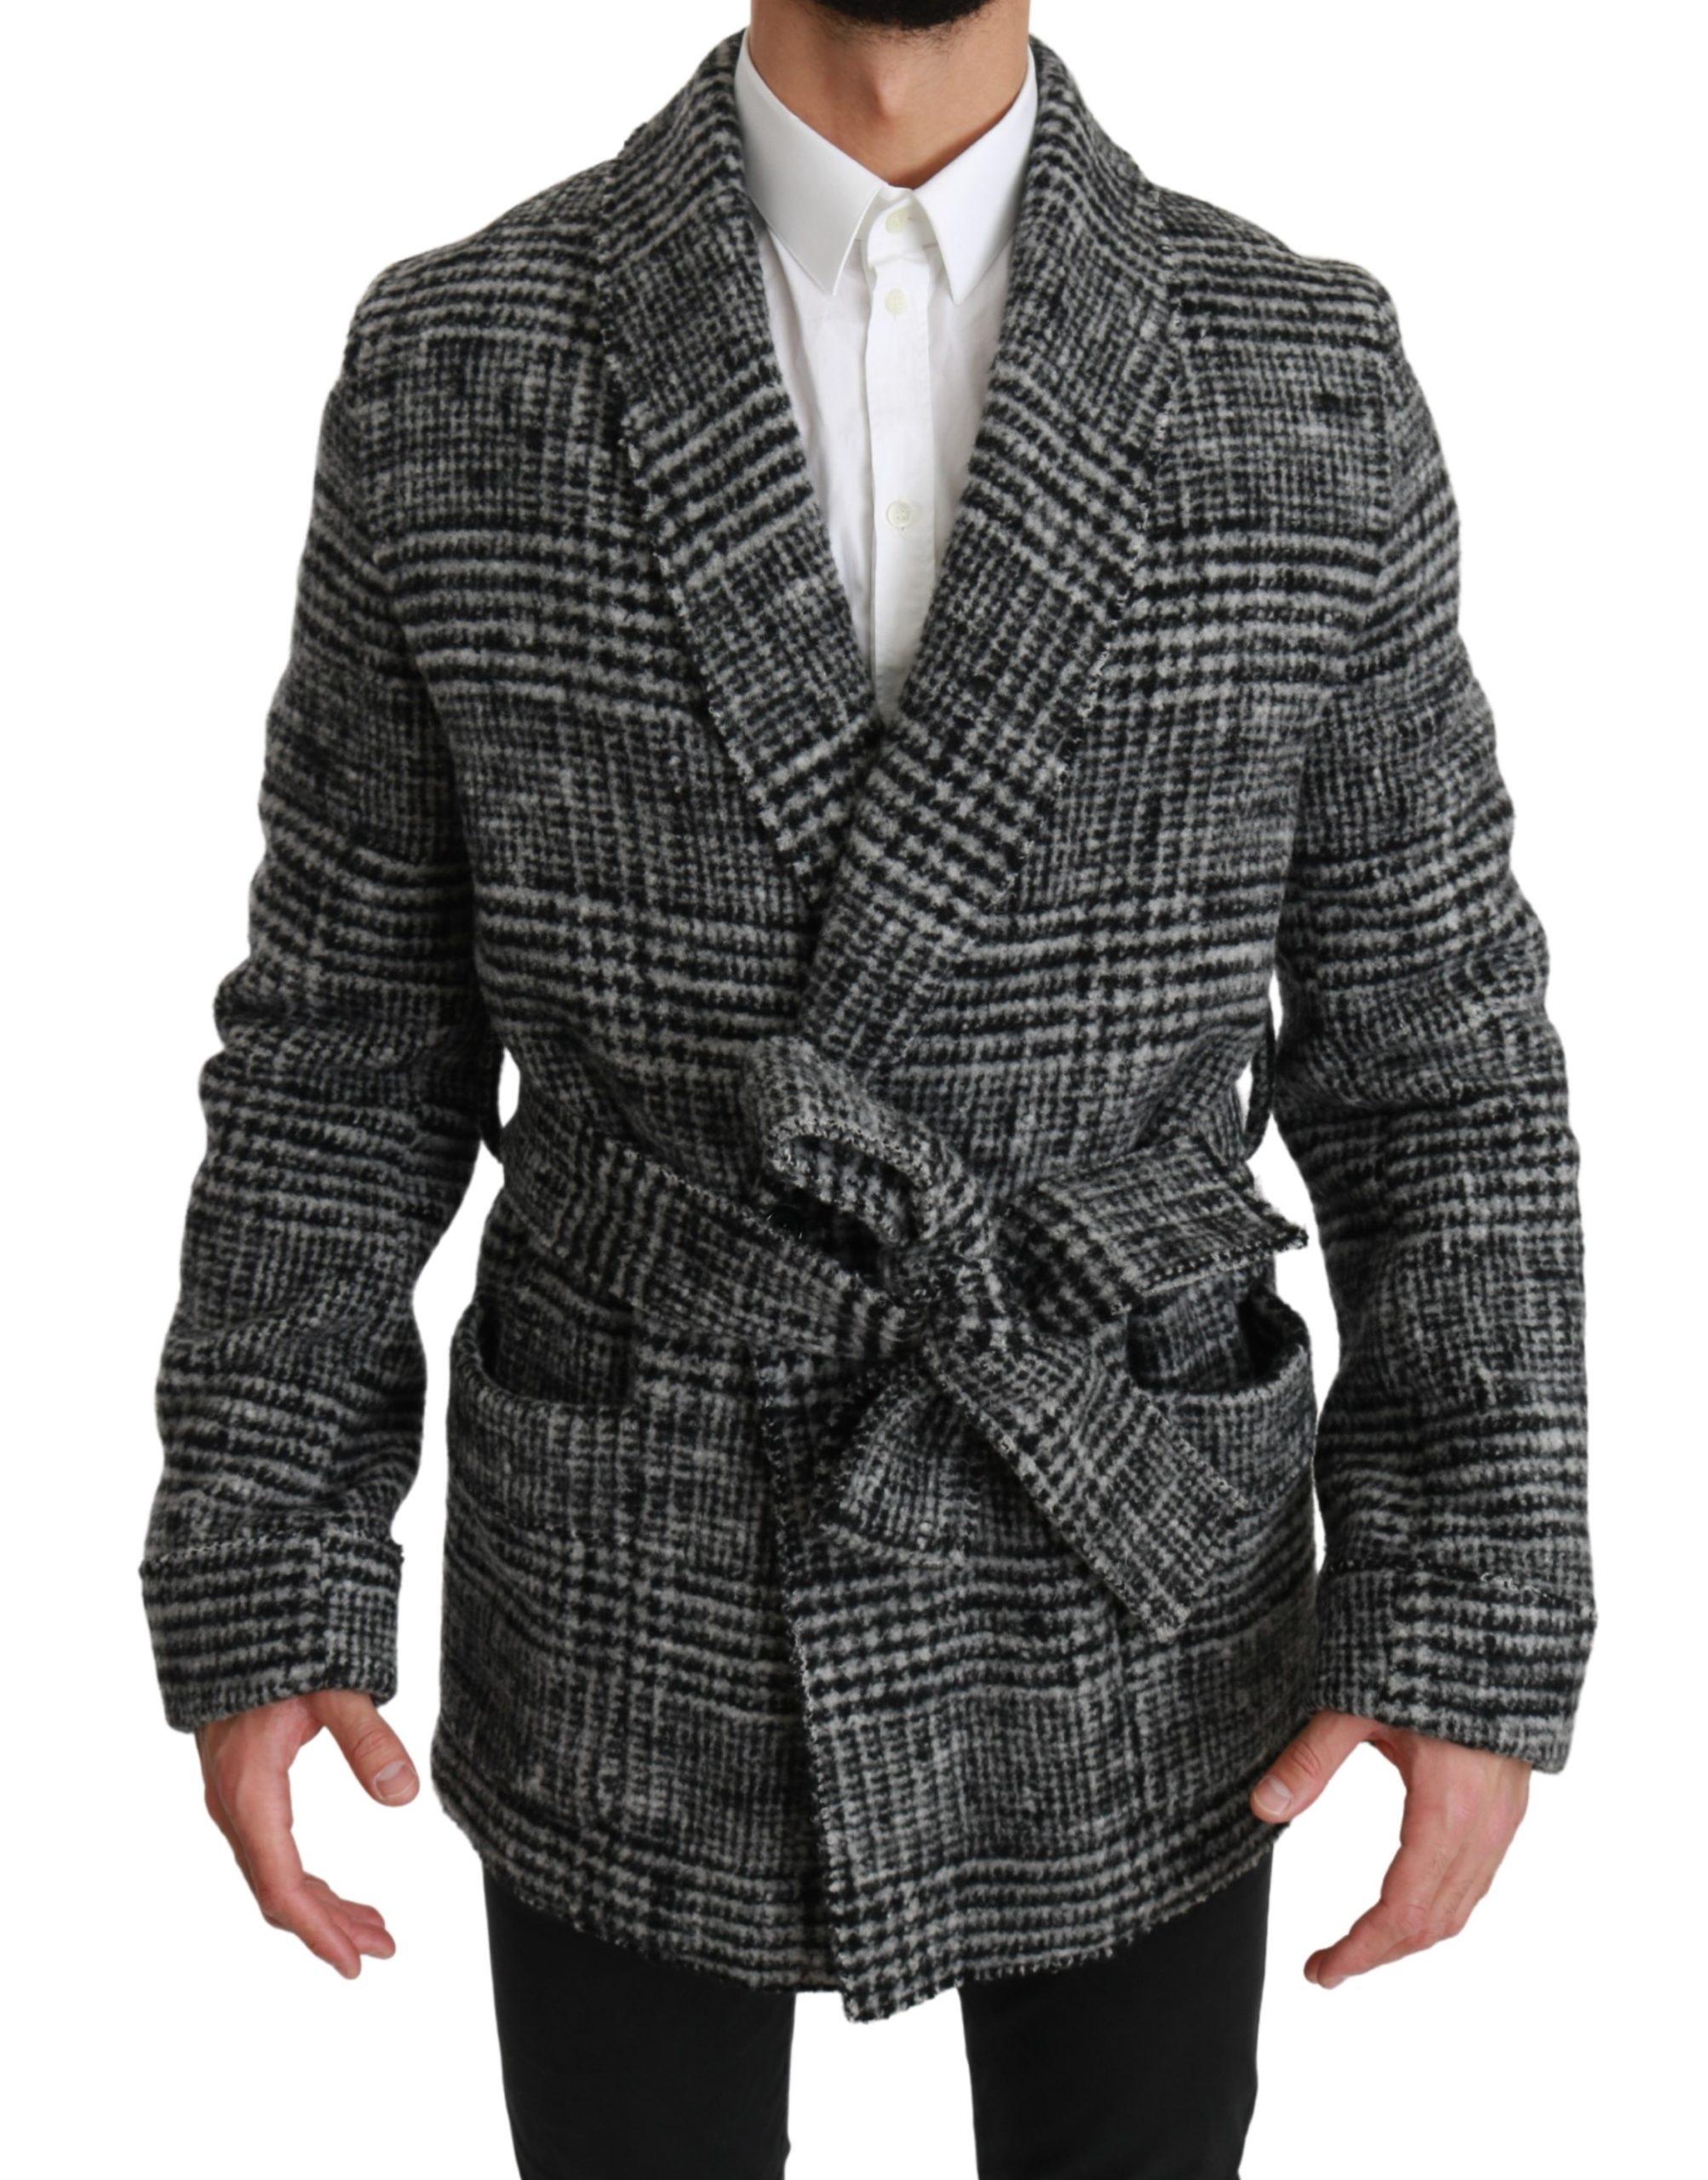 Dolce & Gabbana Men's Checkered Wool Robe Coat Wrap Jacket Gray JKT2489 - IT48   M